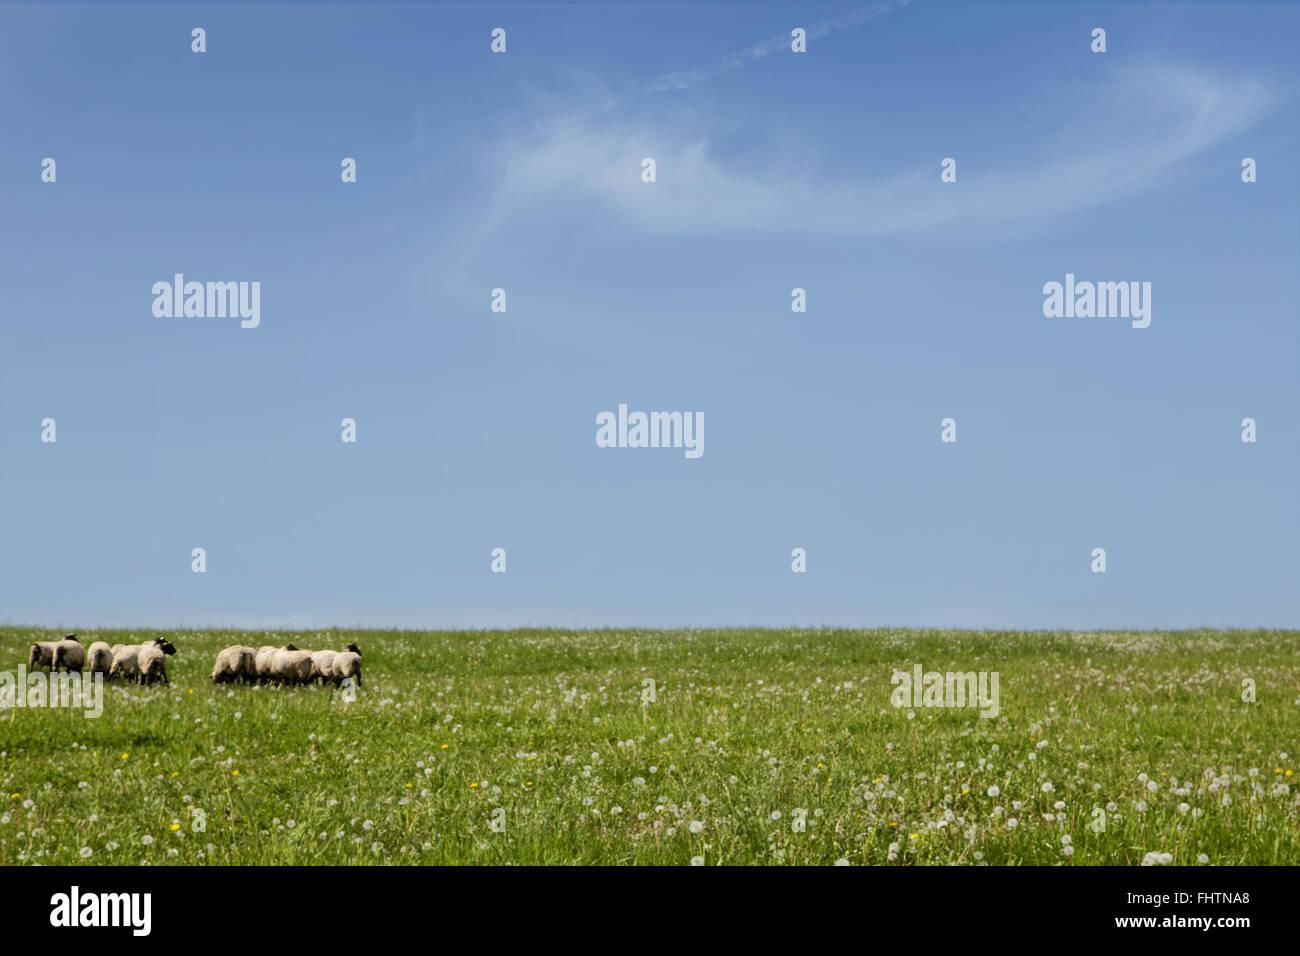 Traditional farming. - Stock Image